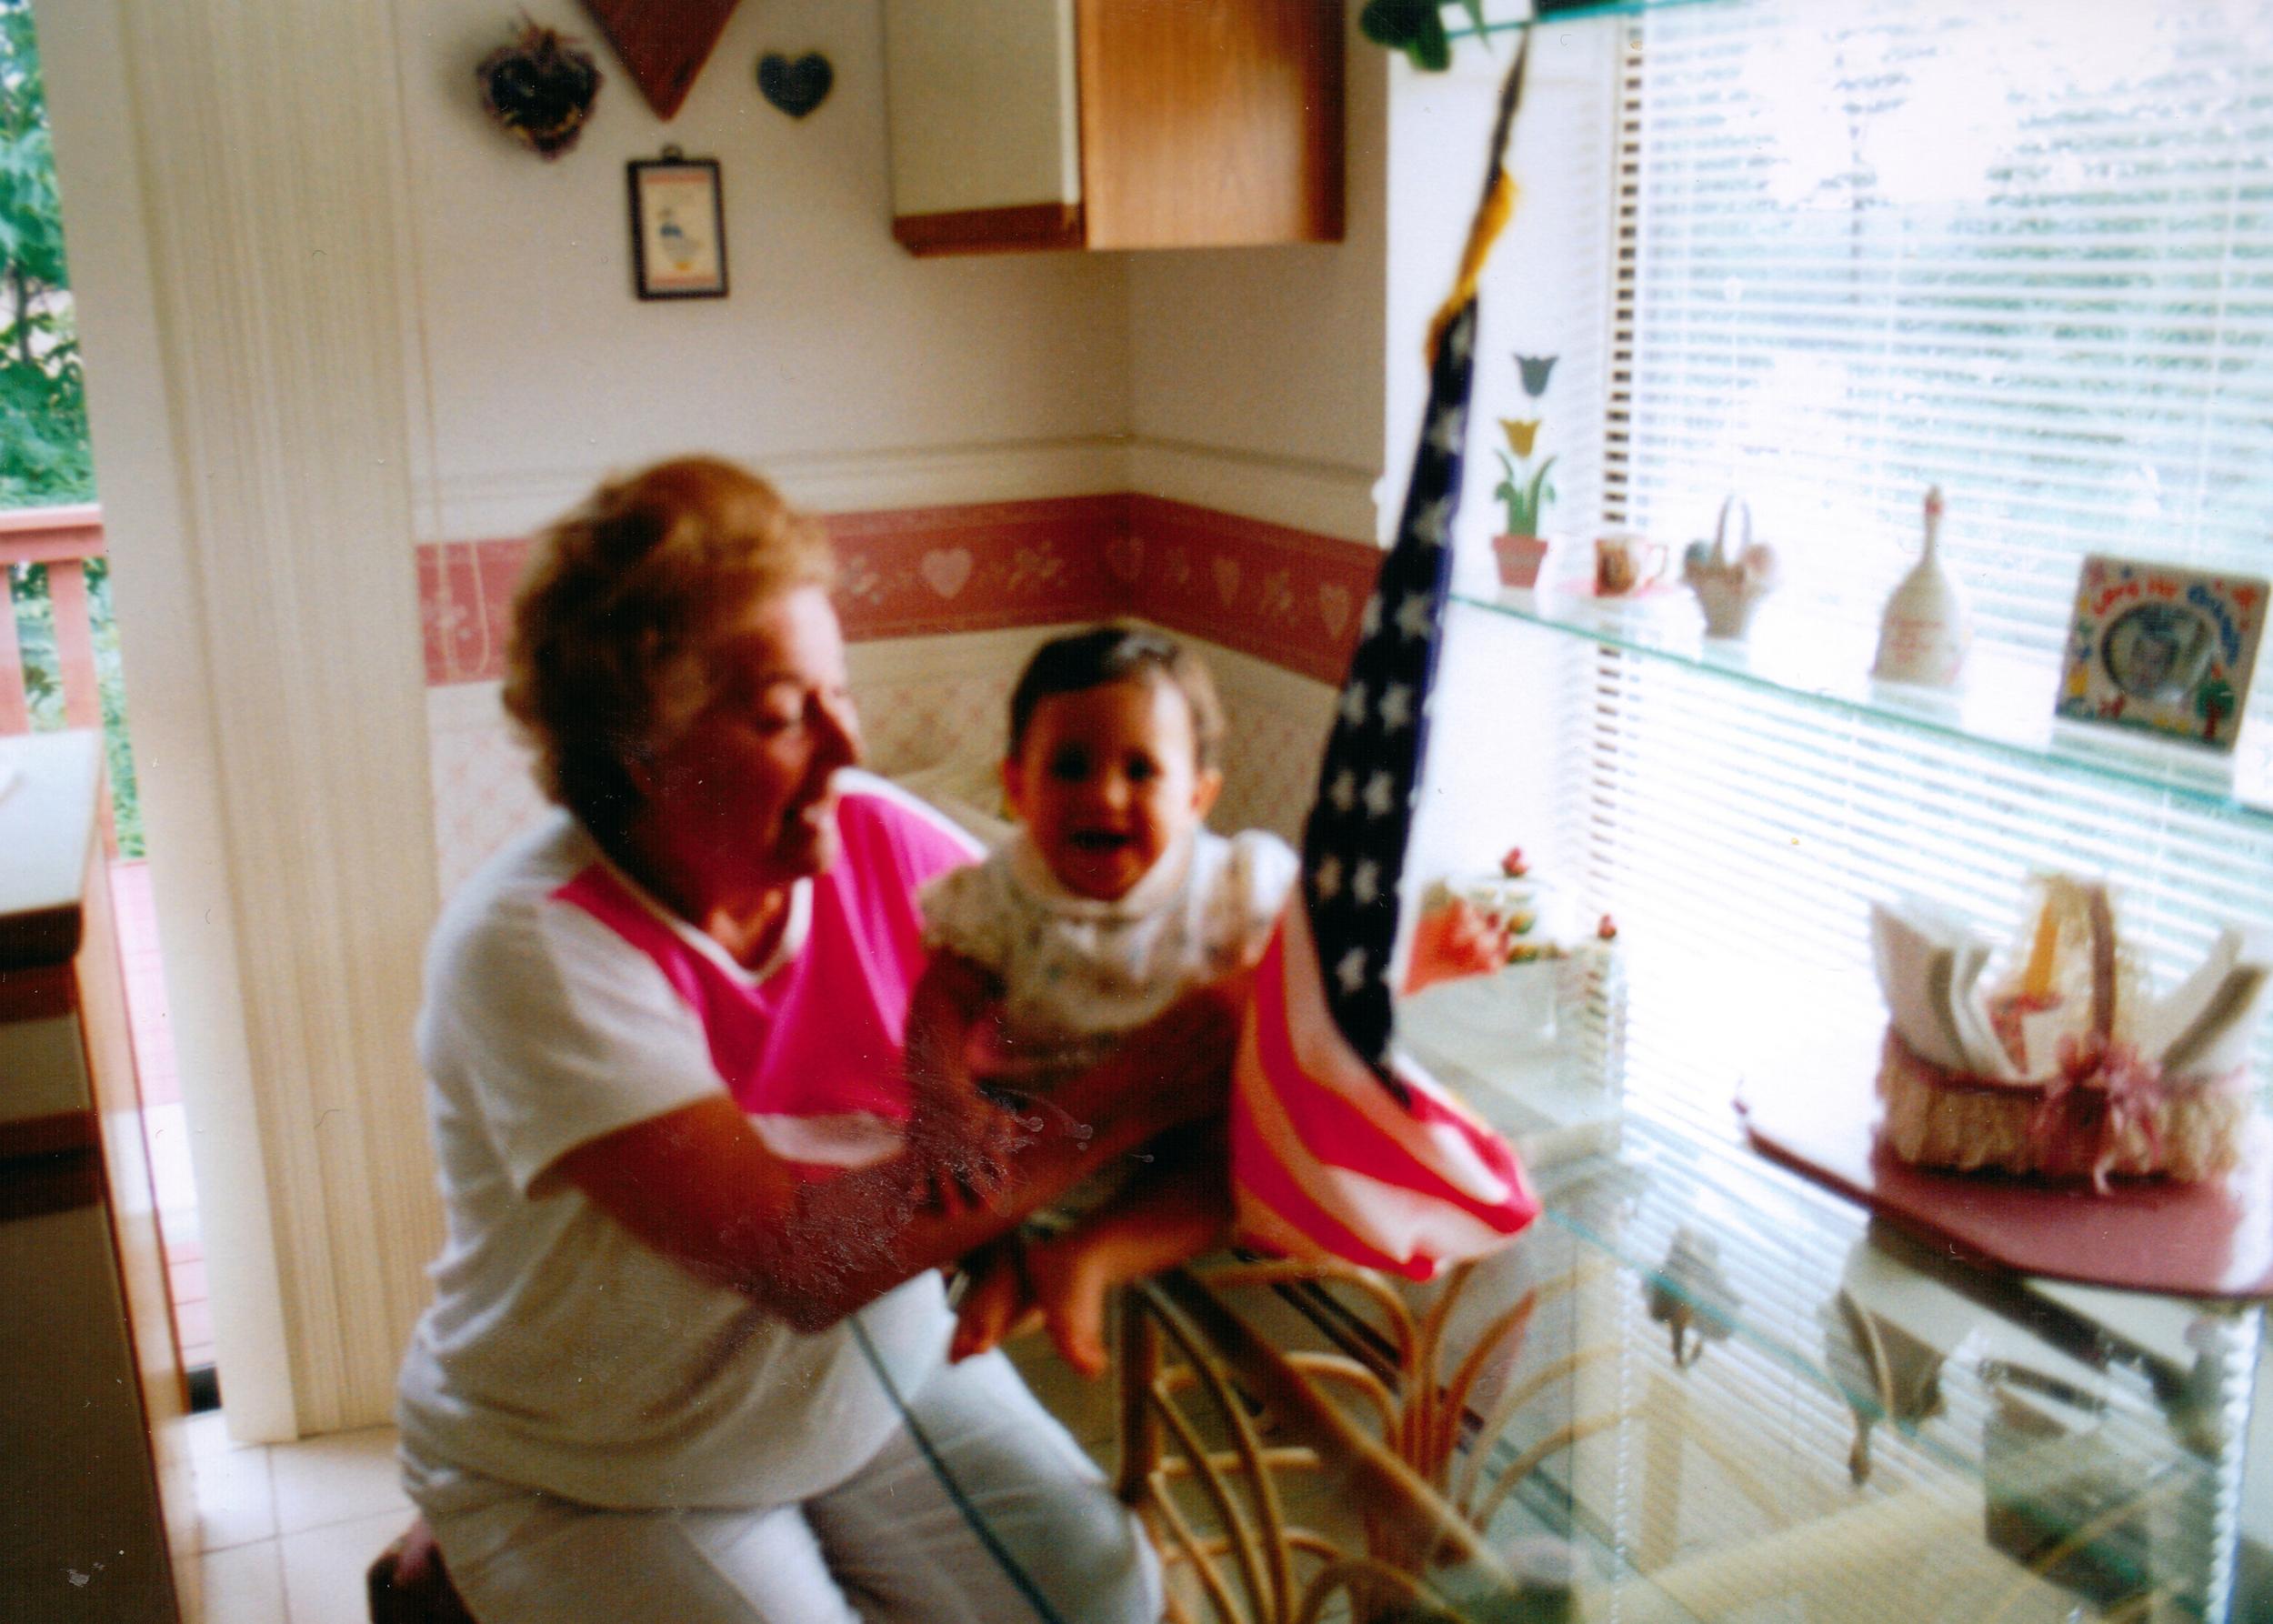 My Nana teaching me how to dance on tables.